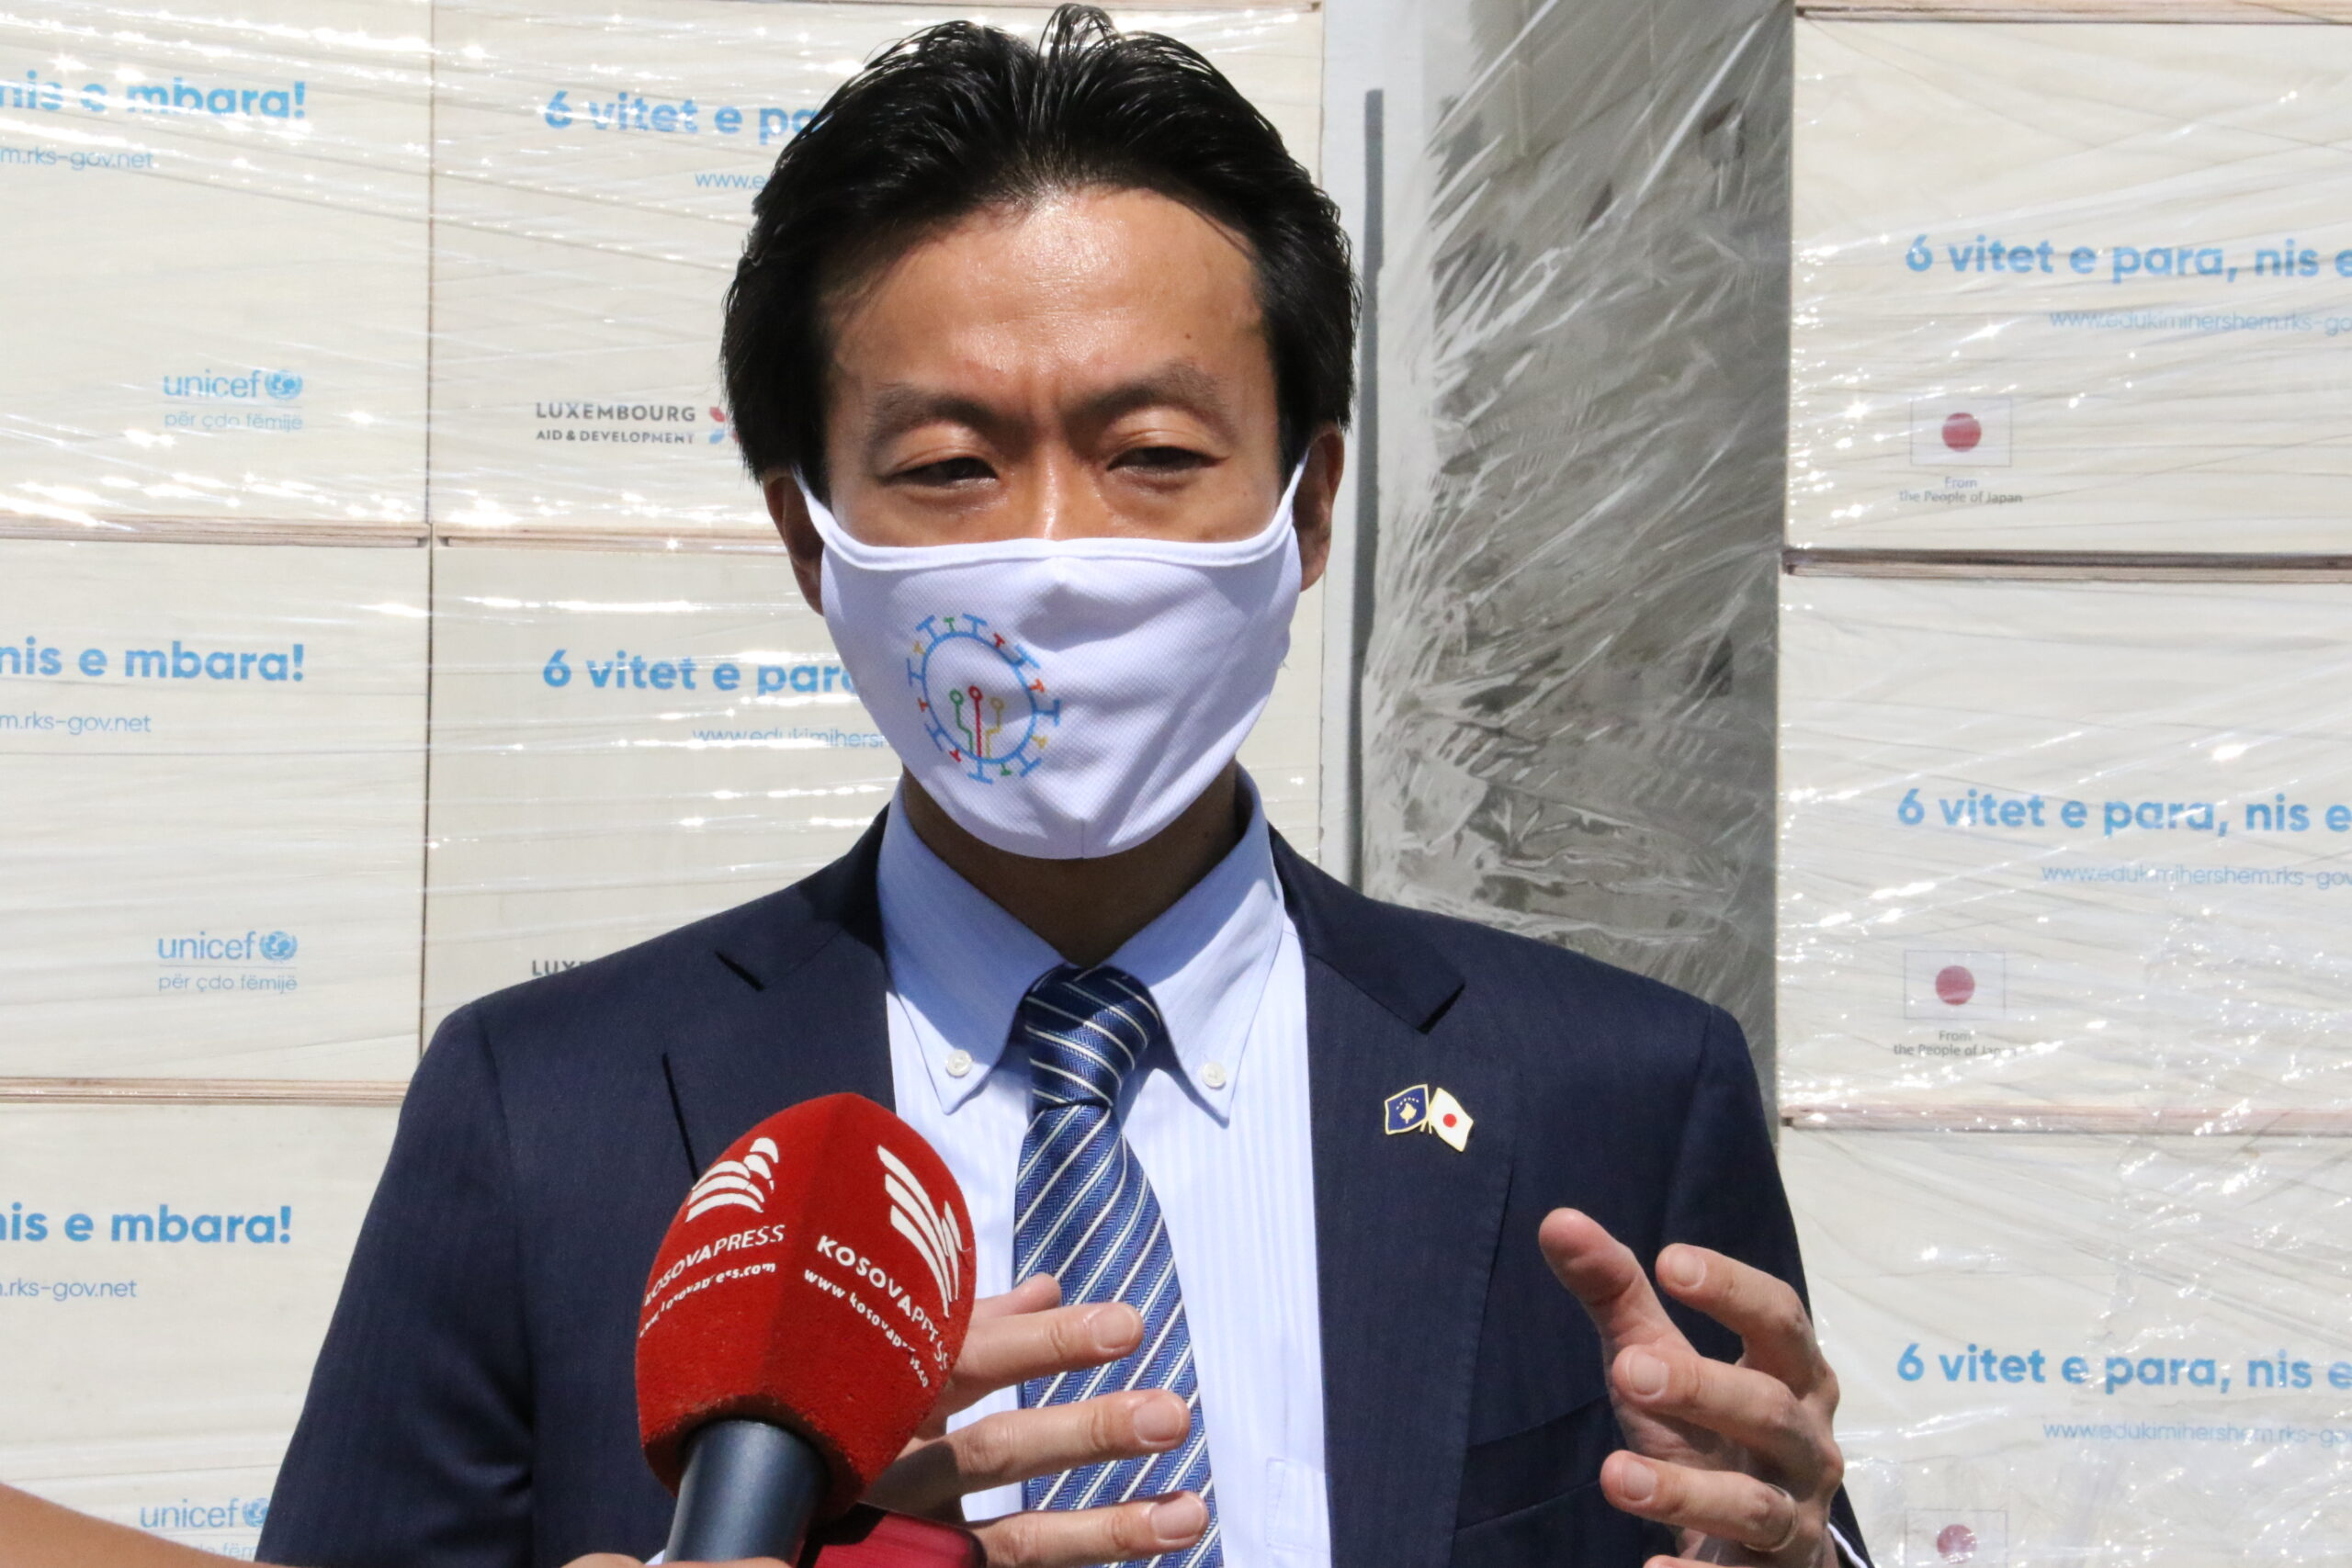 Charge d'Affaires the Embassy of Japan in Kosovo, Mr. Mitsunori Ogasawara